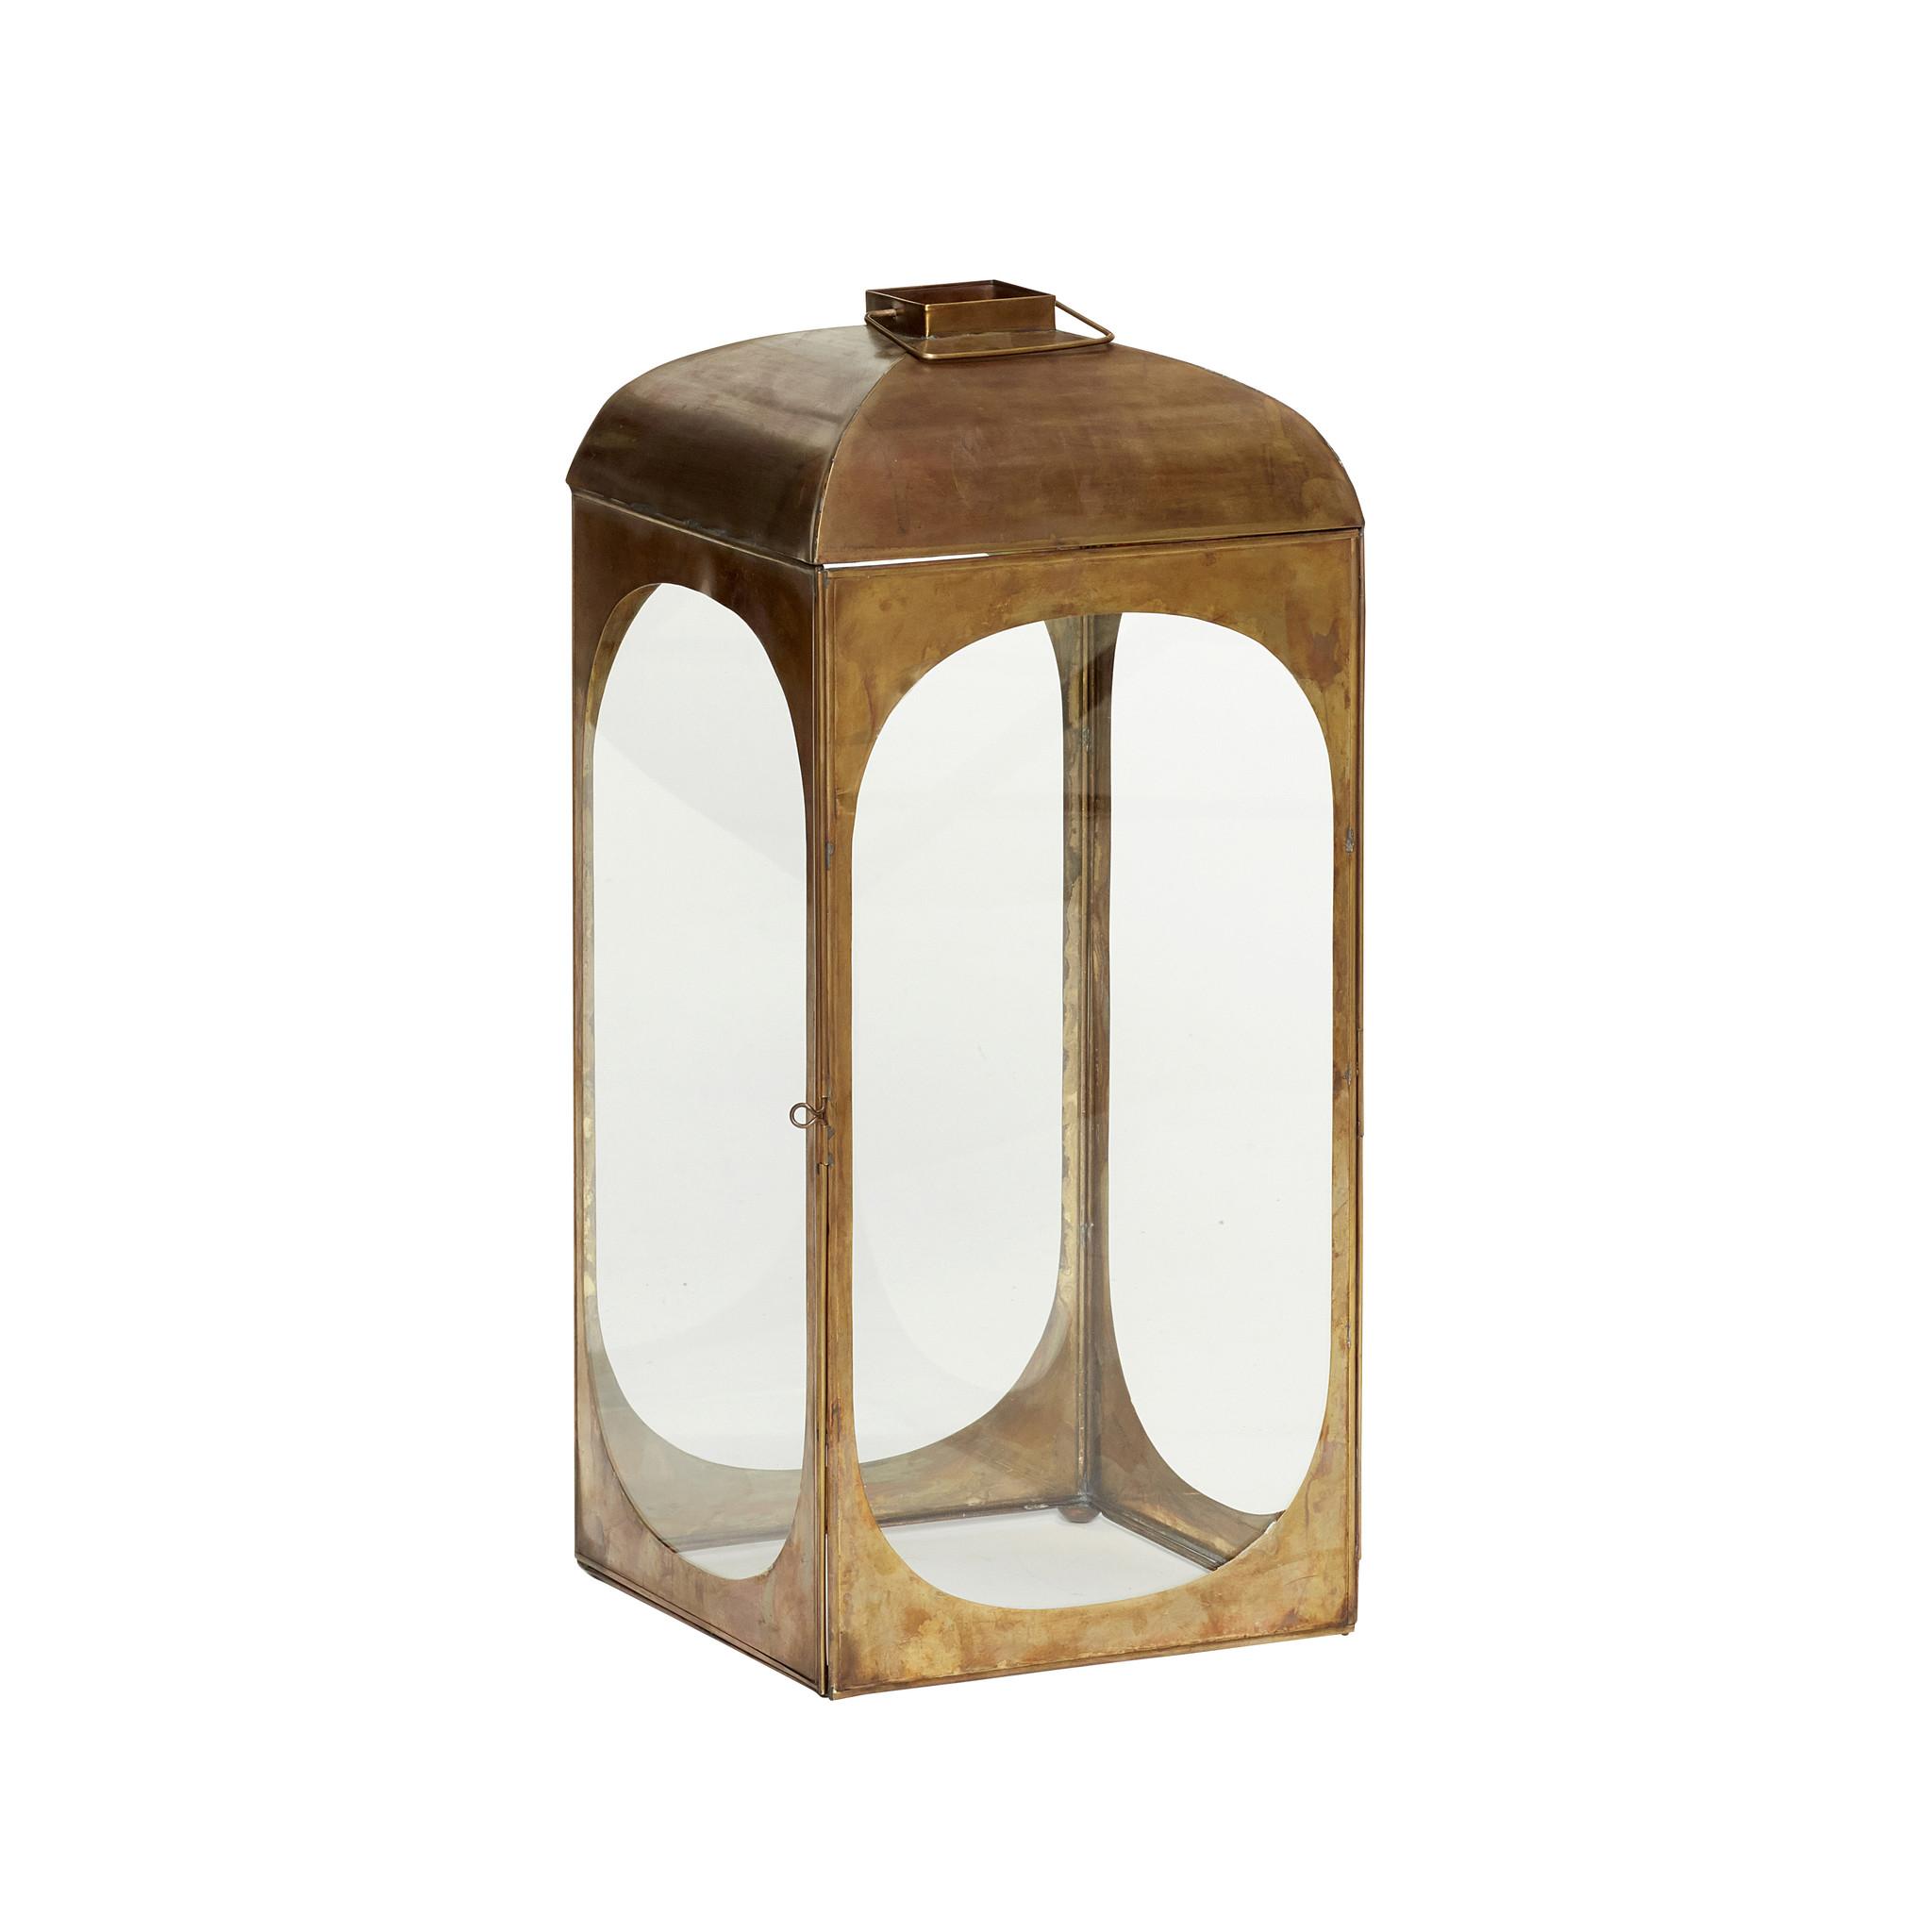 Hubsch Lantaarn met handgrepen, vierkant, messing / glas, klein